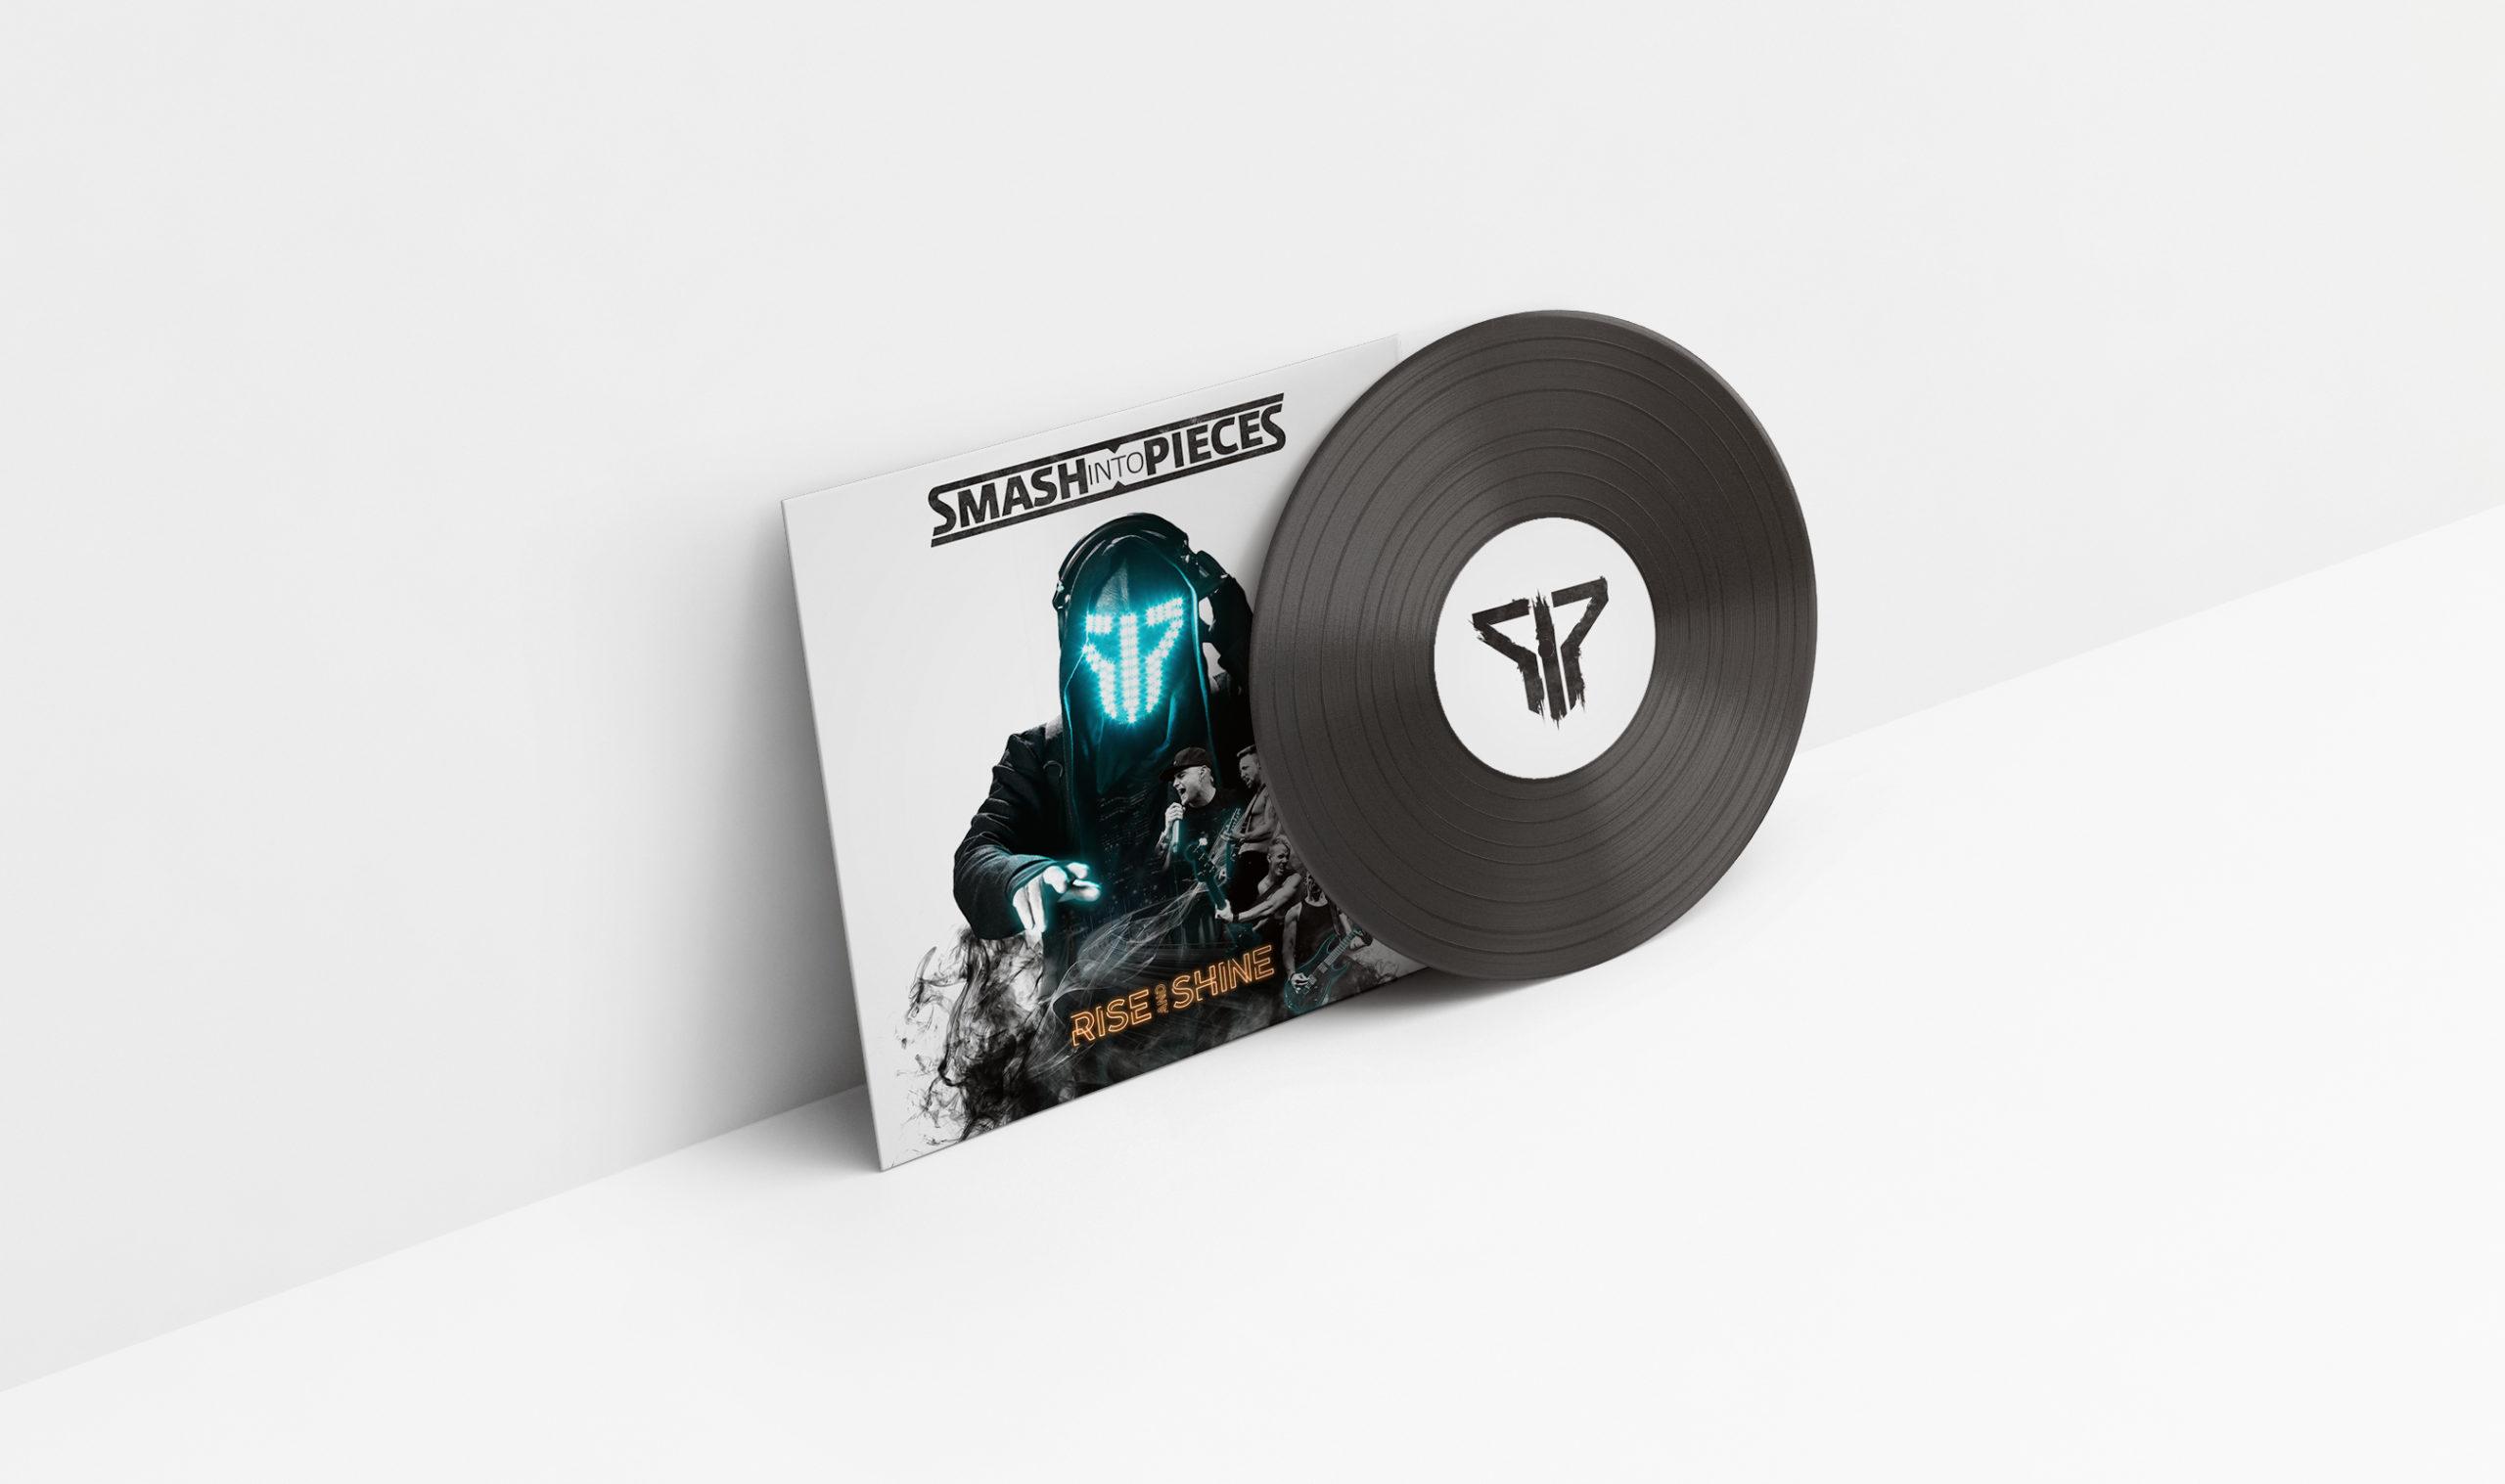 Smash Into Pieces - Rise and Shine Vinyl